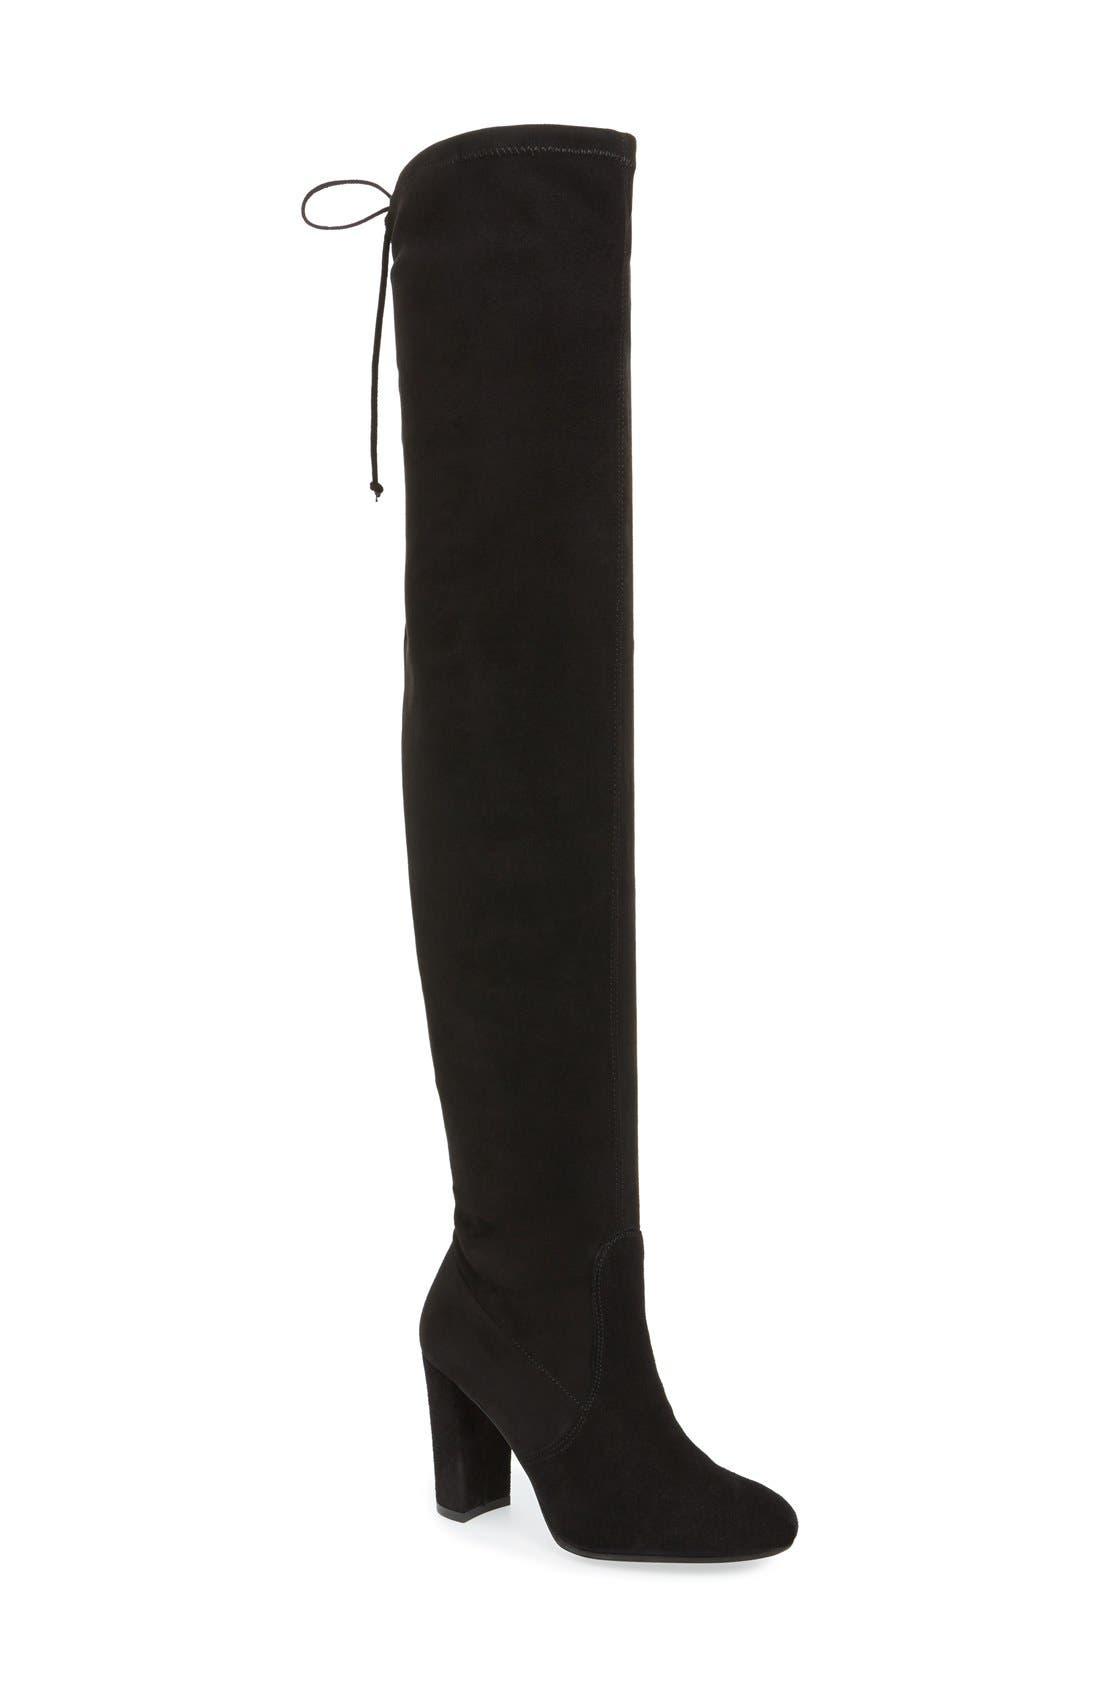 Alternate Image 1 Selected - Dune London Sibyl Over the Knee Boot (Women)